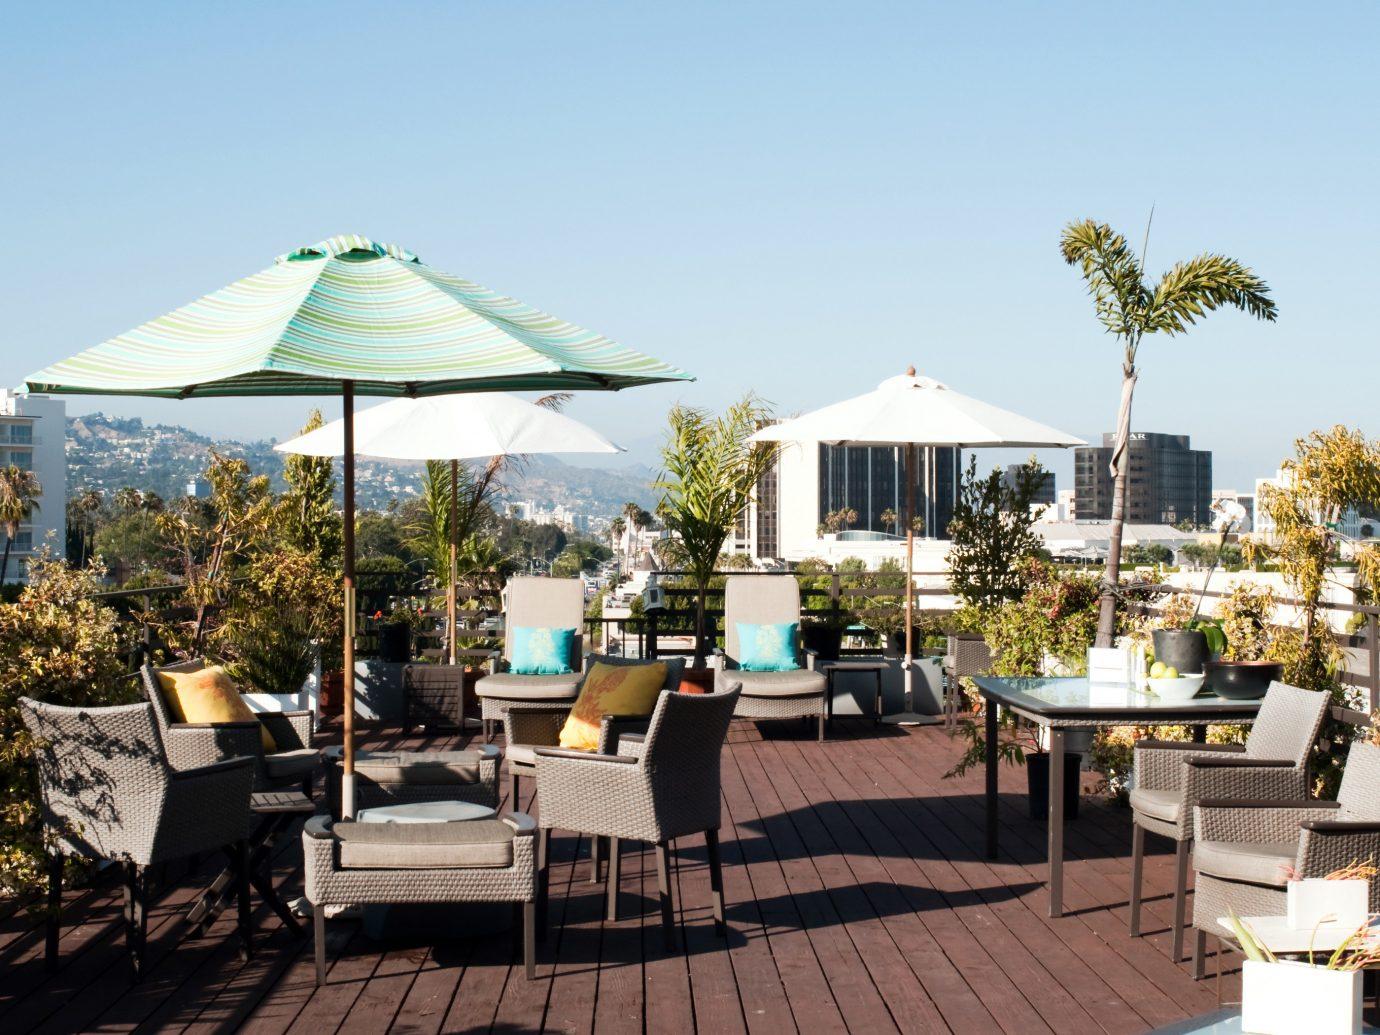 Offbeat chair estate Resort restaurant backyard outdoor structure Villa furniture set area several